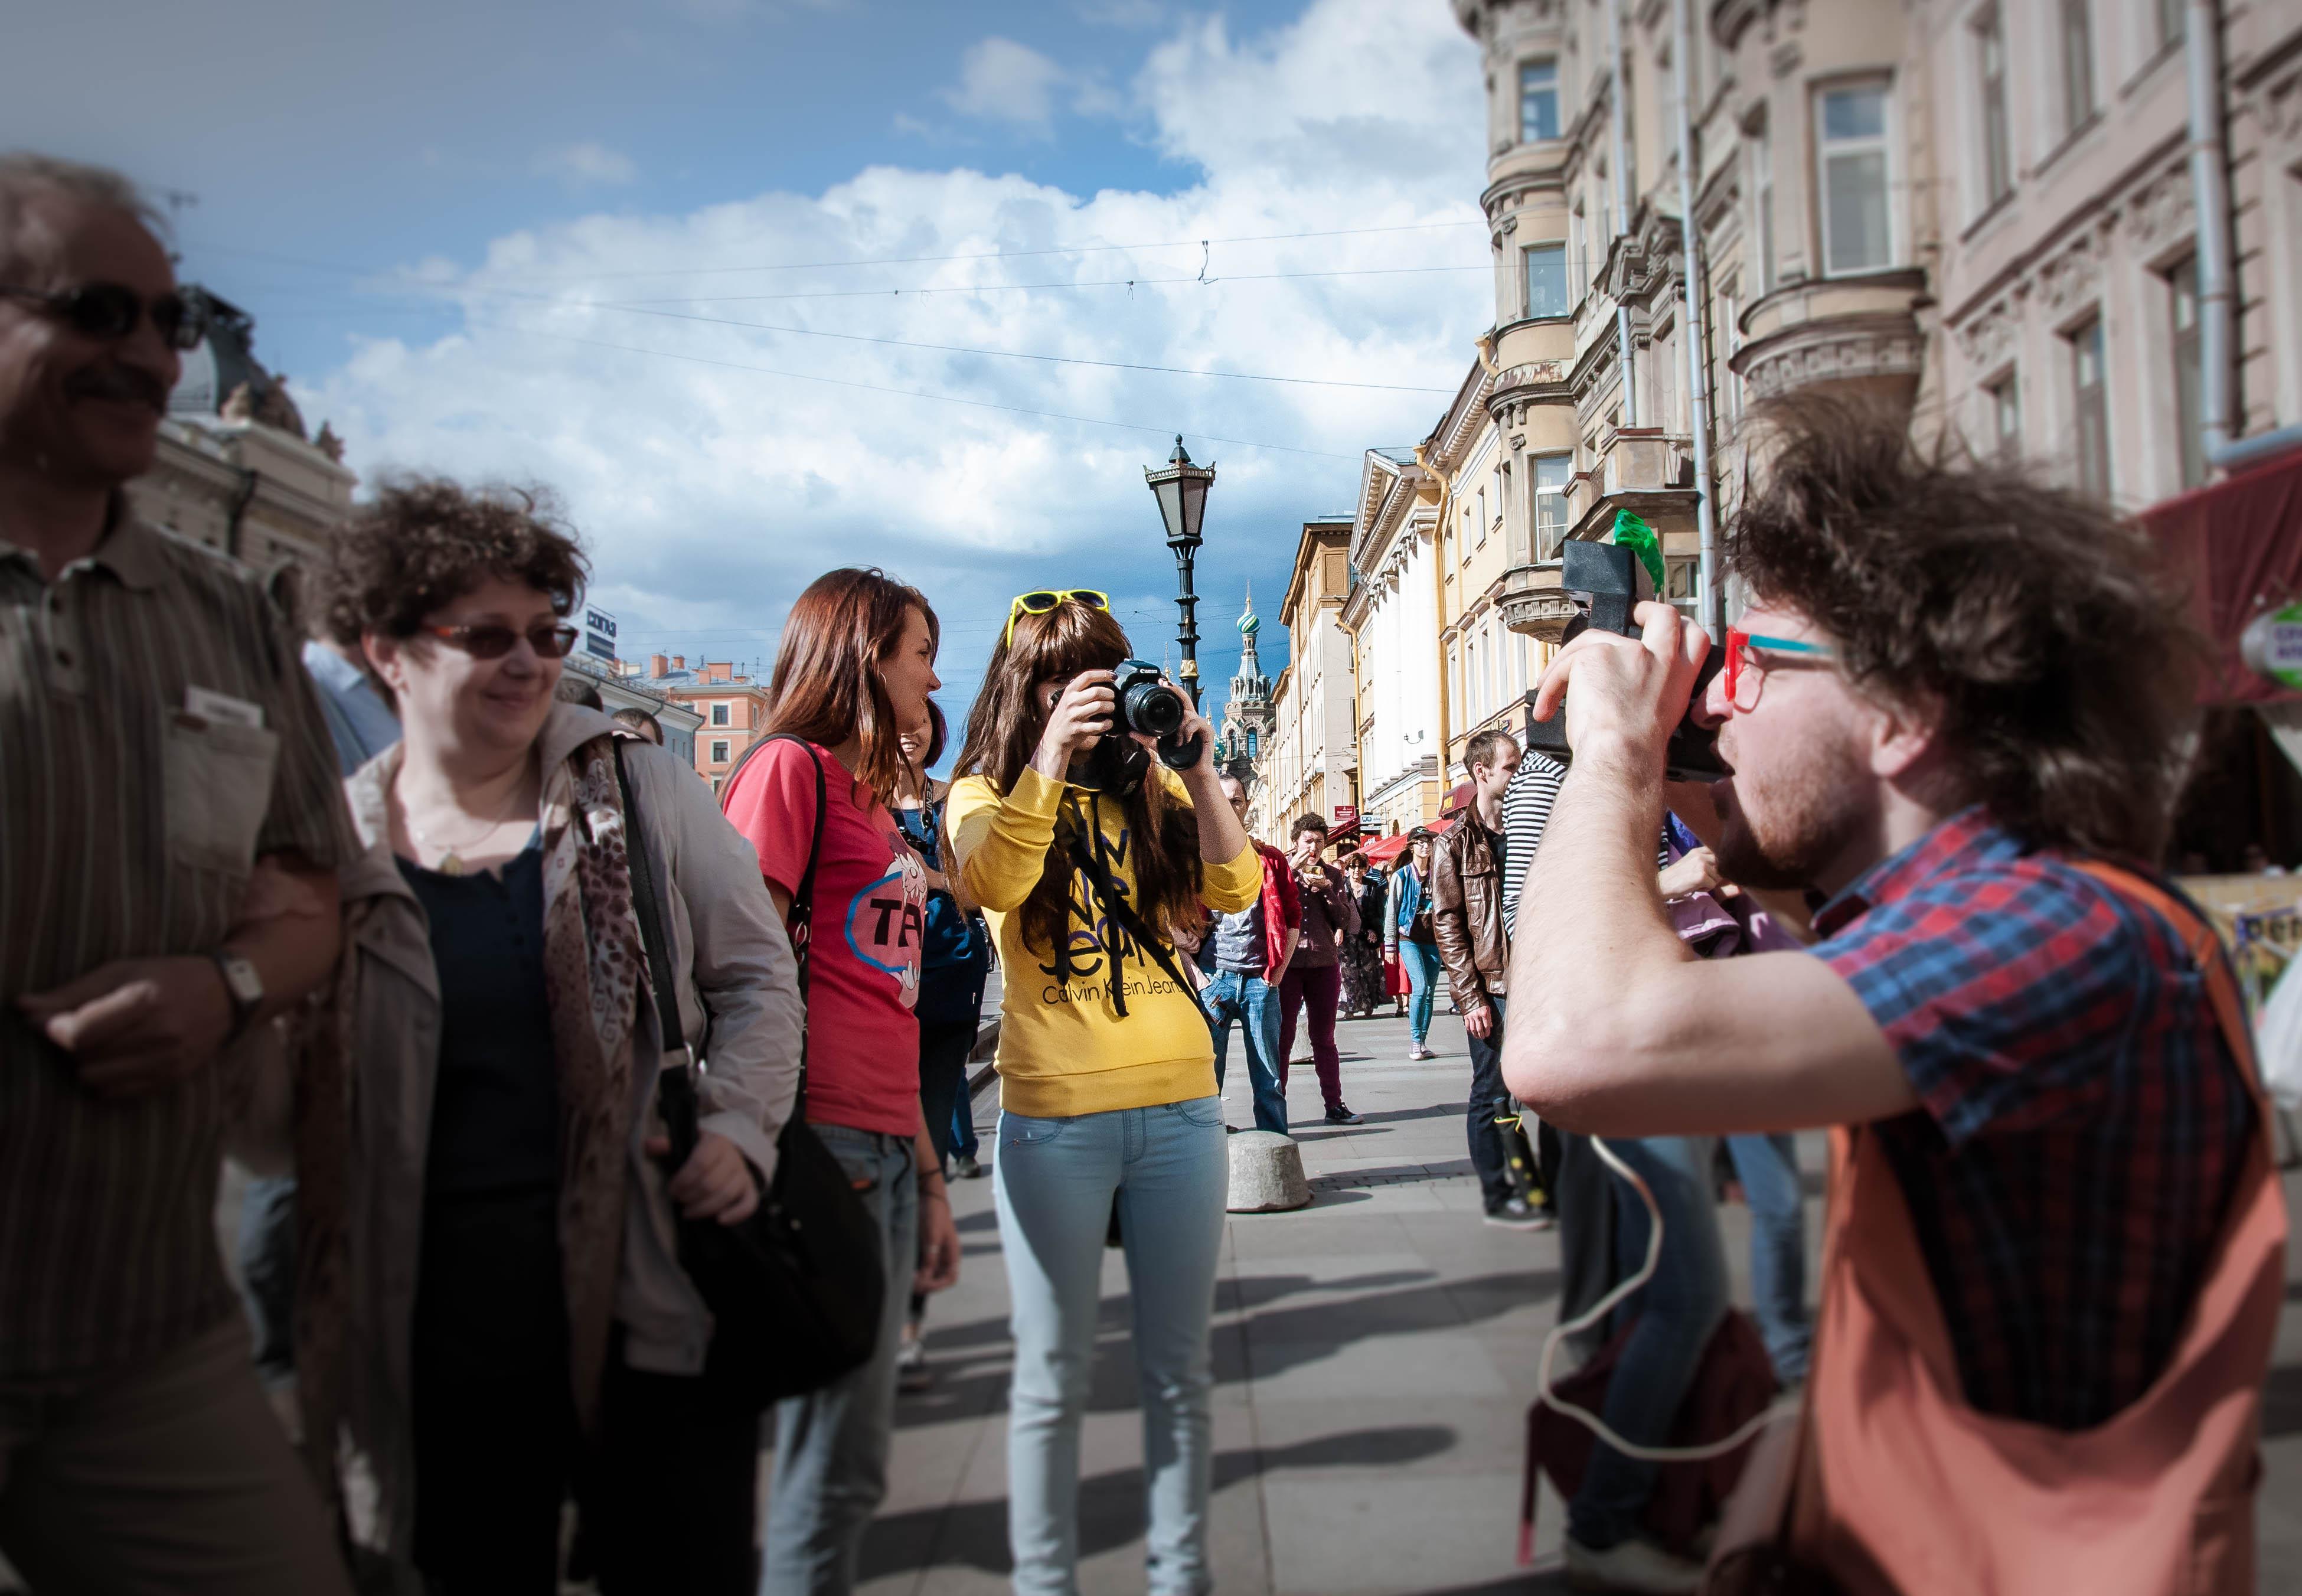 Flickr - Le ragazze ed i ragazzi dell'Est, San Pietroburgo